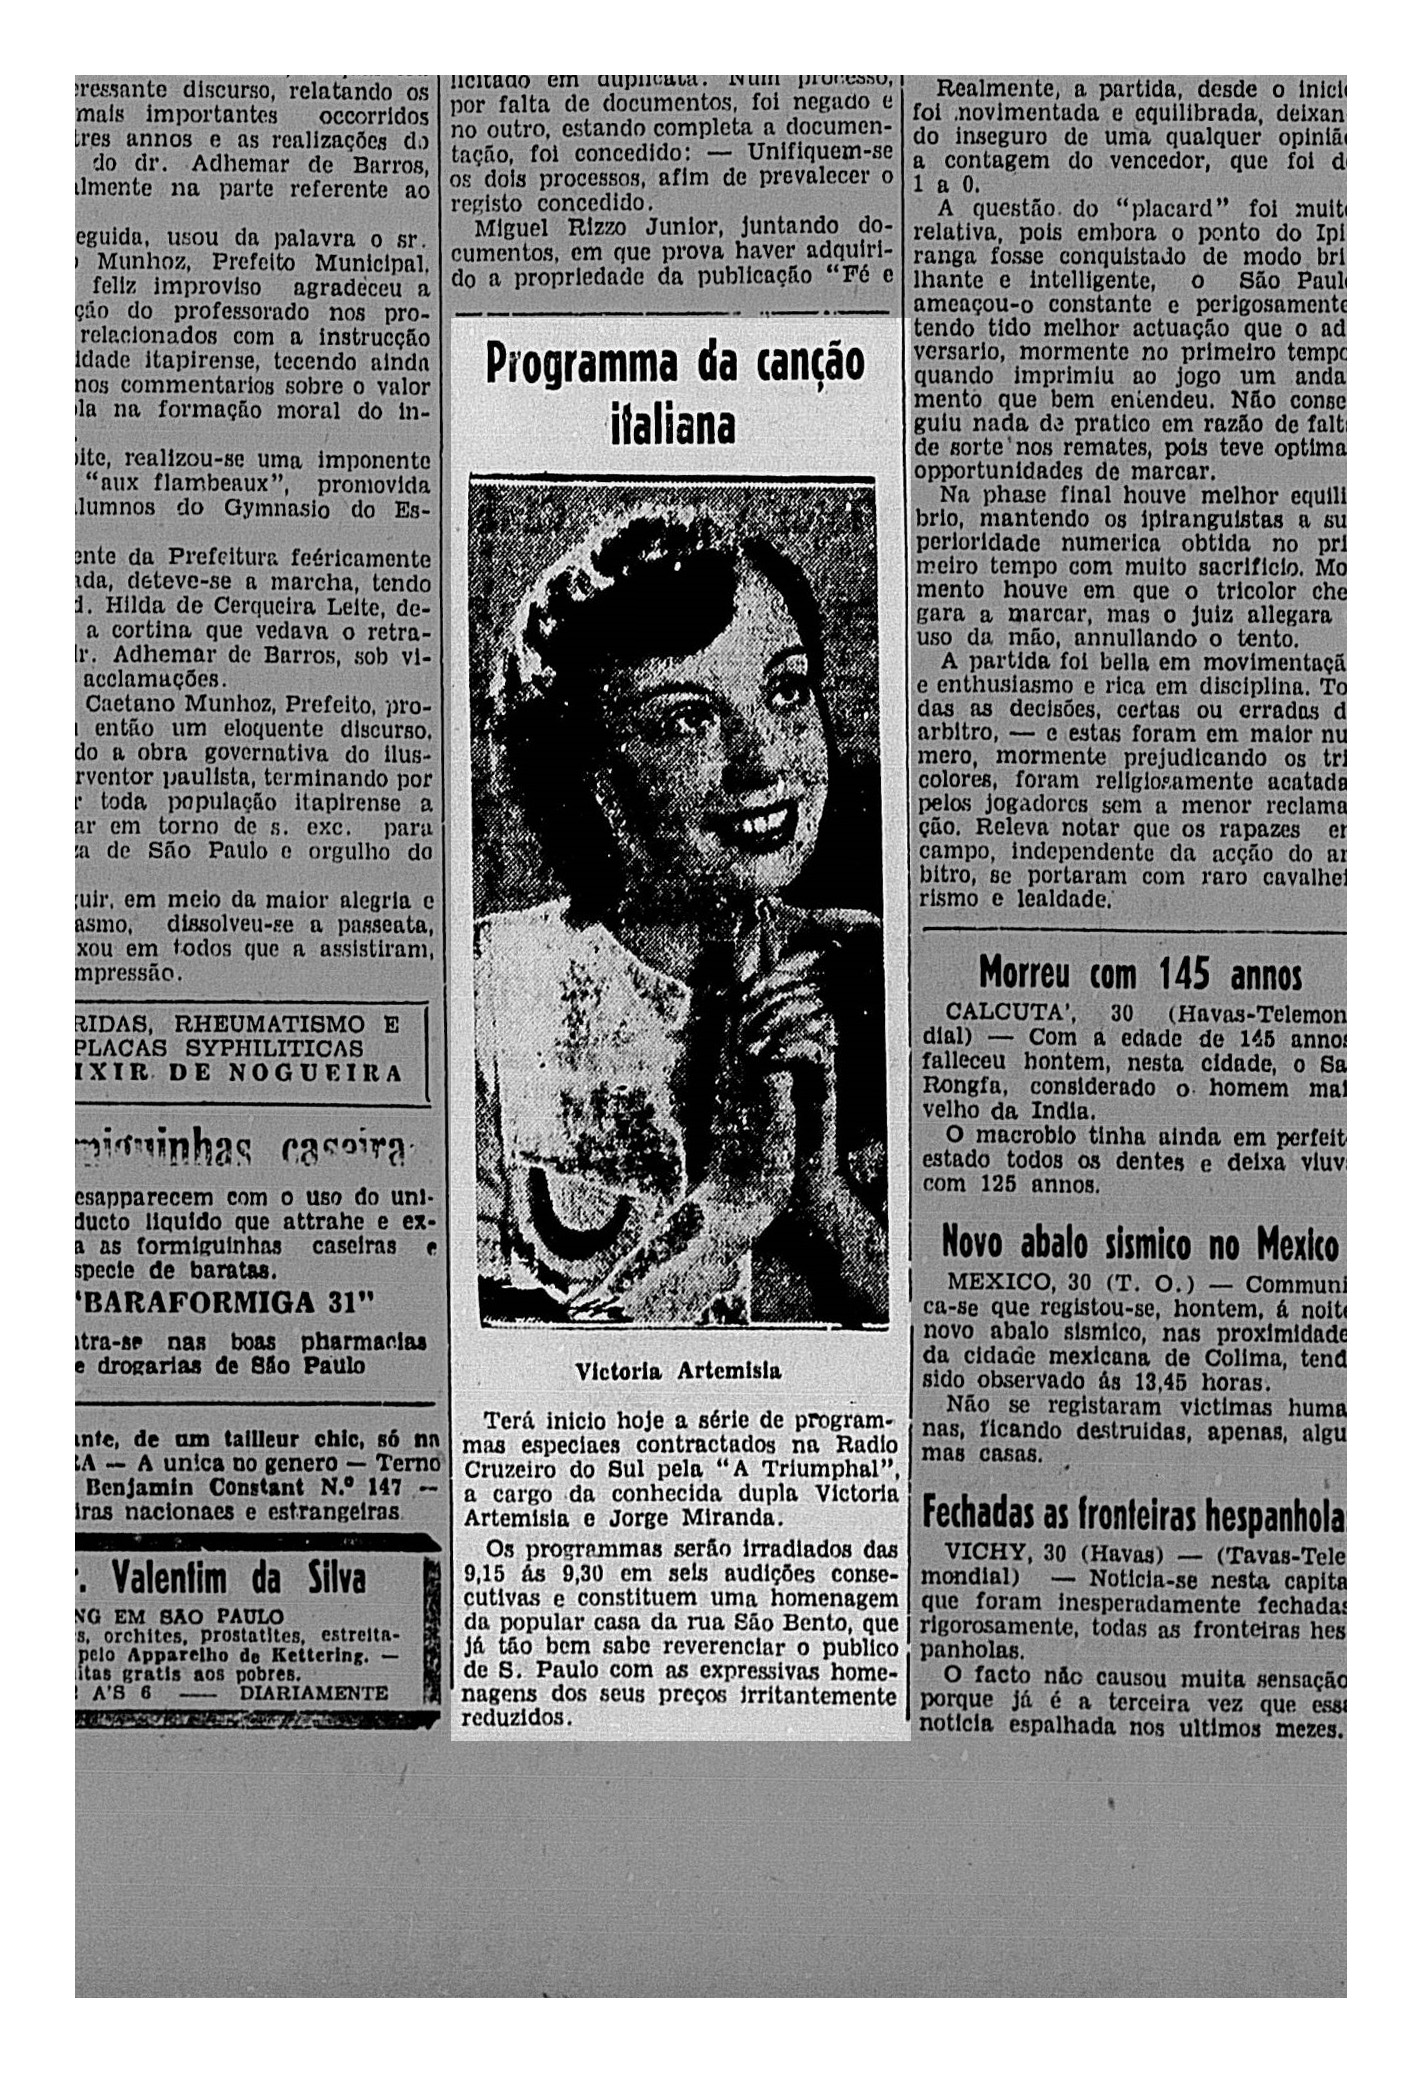 Vitoria-Artemisia-1941-05-01_CorreioPaulistano_SãoPaulo-SP-2-copy.jpg